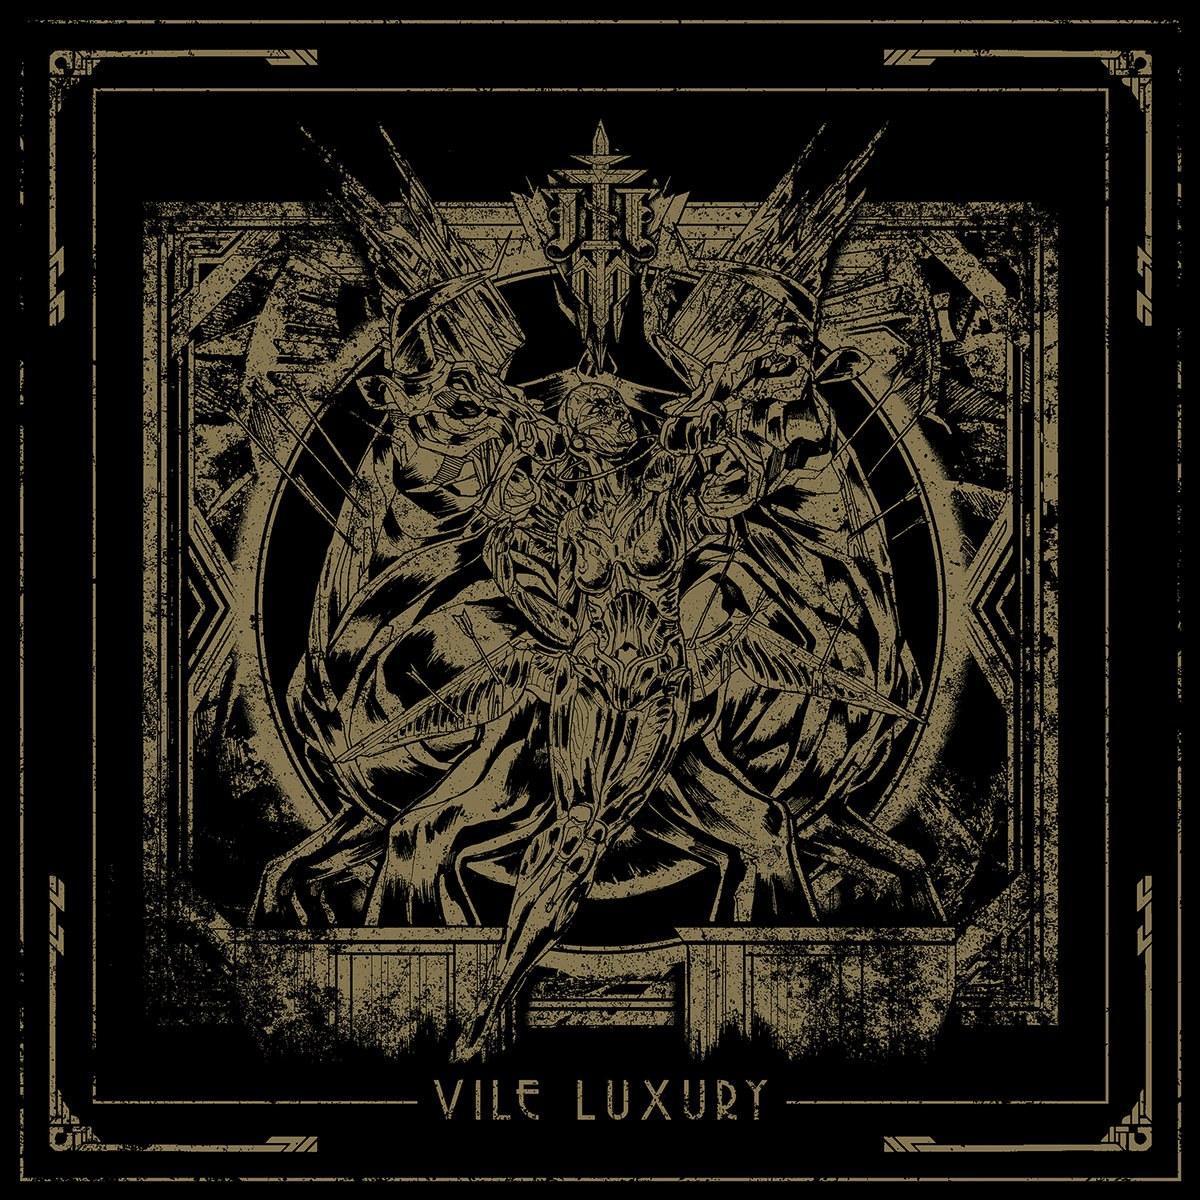 Reviews for Imperial Triumphant - Vile Luxury